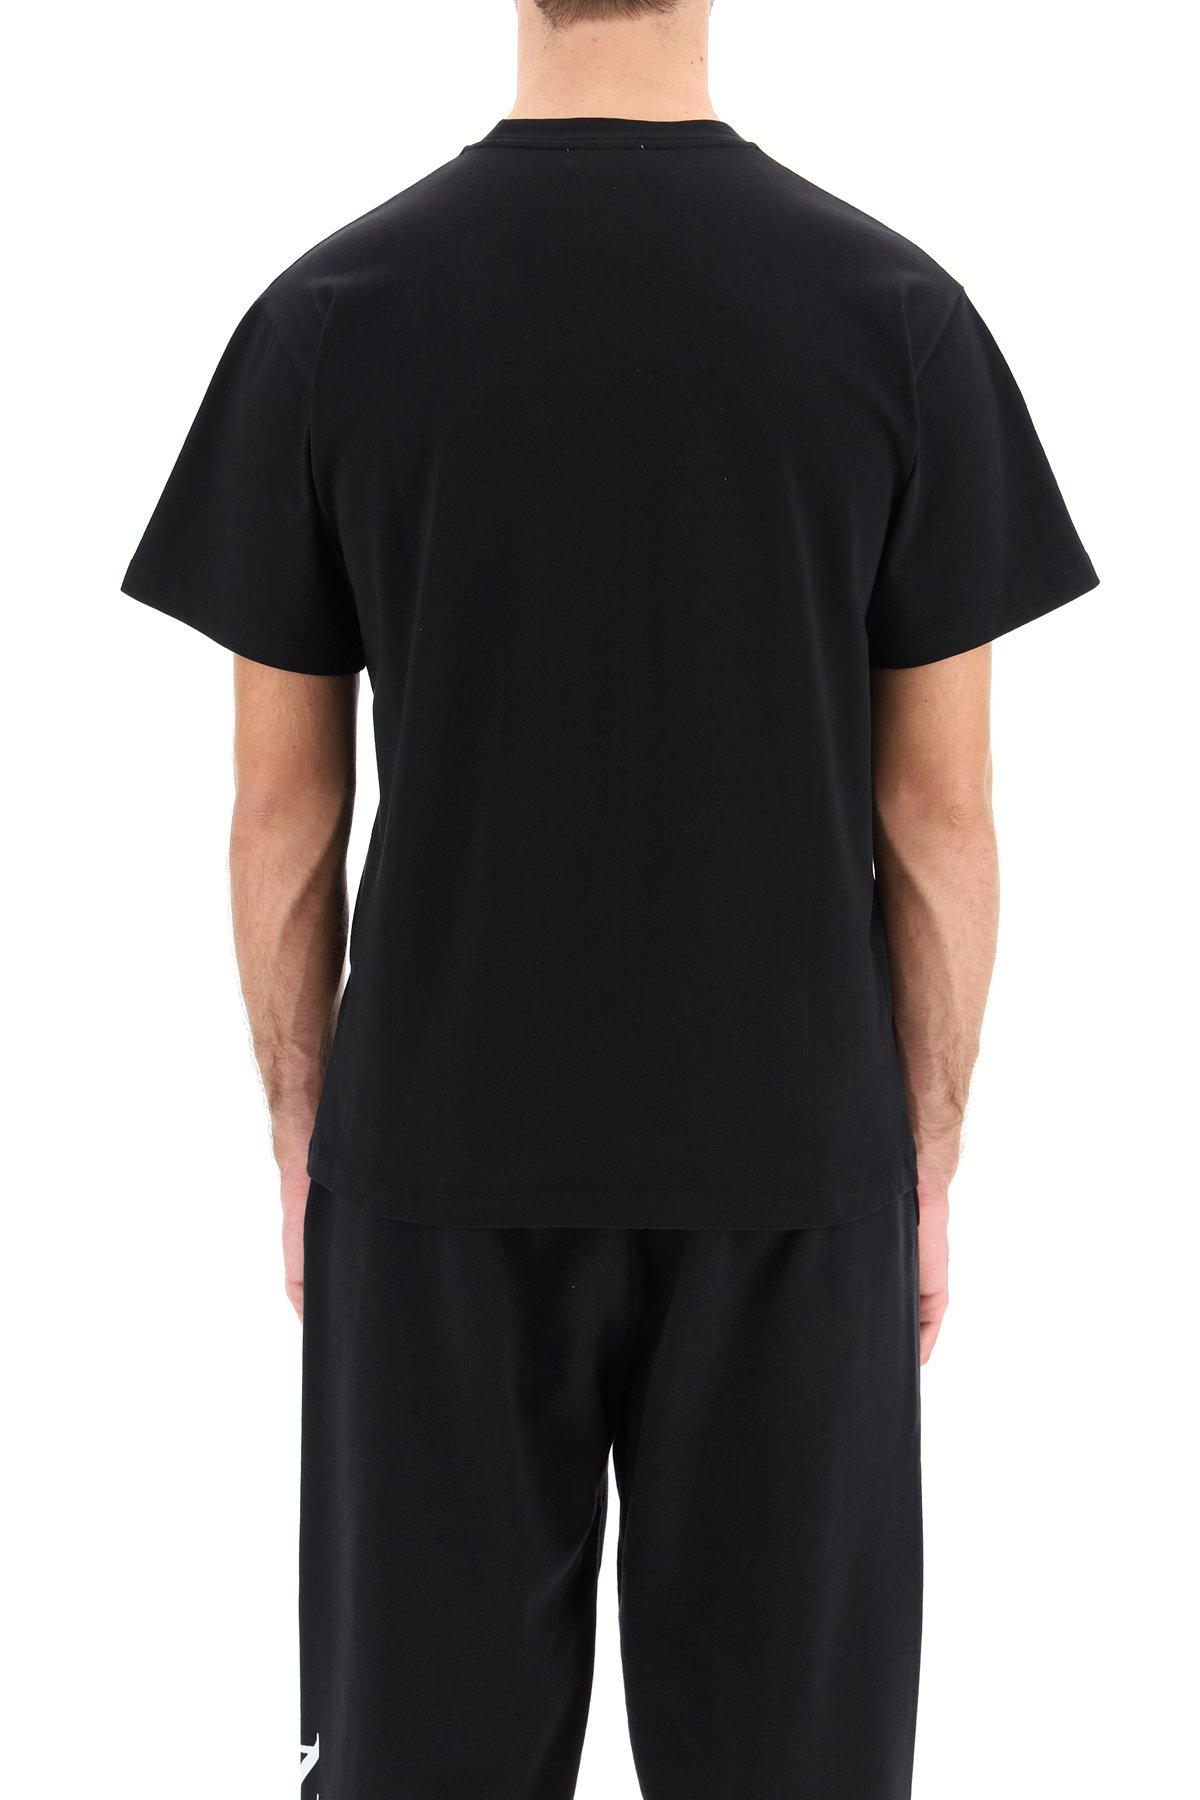 Aries t-shirt stampa no problemo